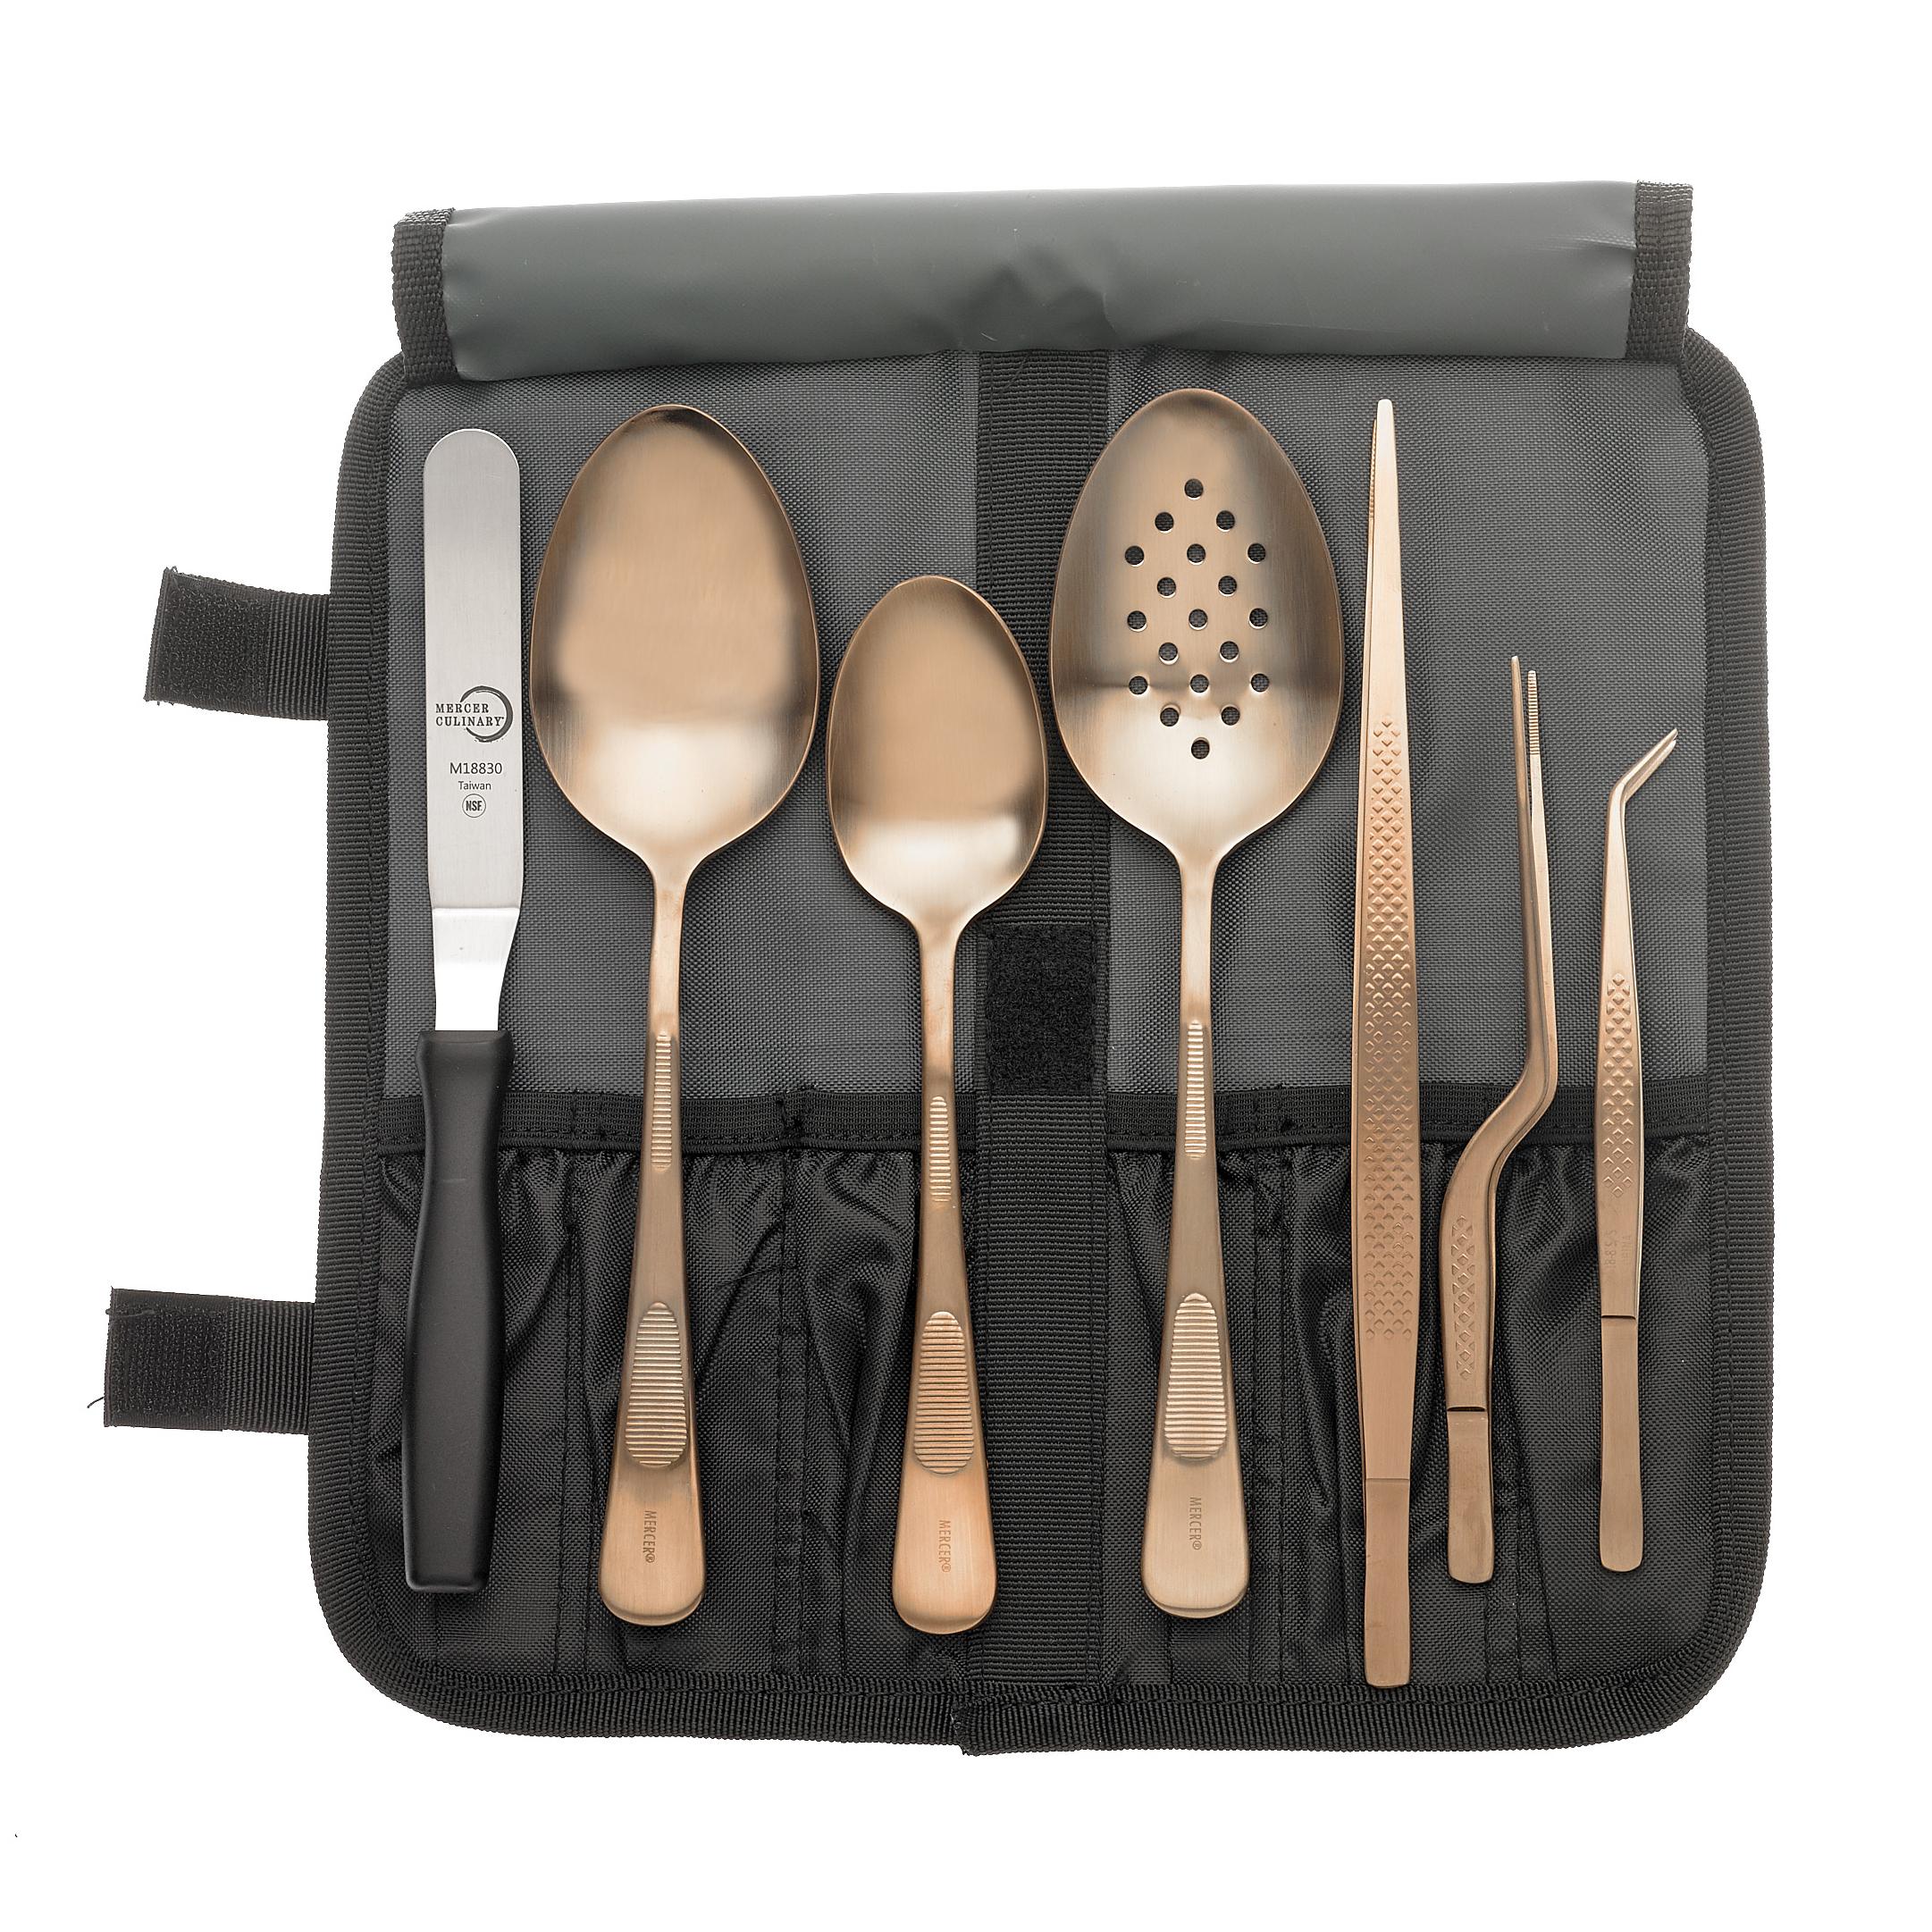 Mercer Culinary M35156RG plating tool